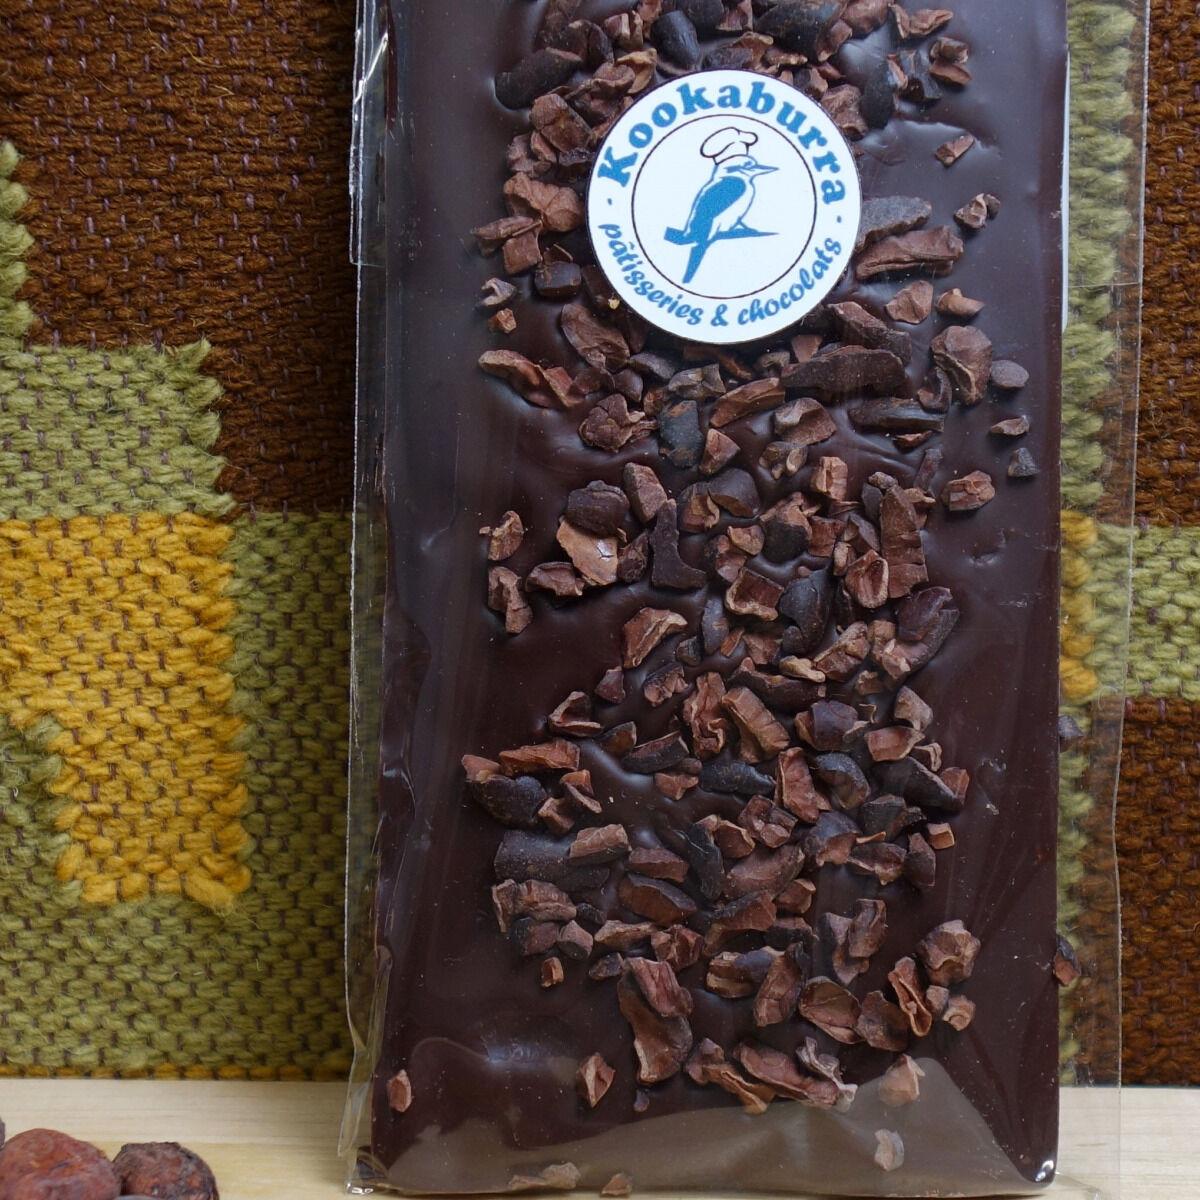 Pâtisserie Kookaburra Tablette Chocolat Noir 70% & Grué